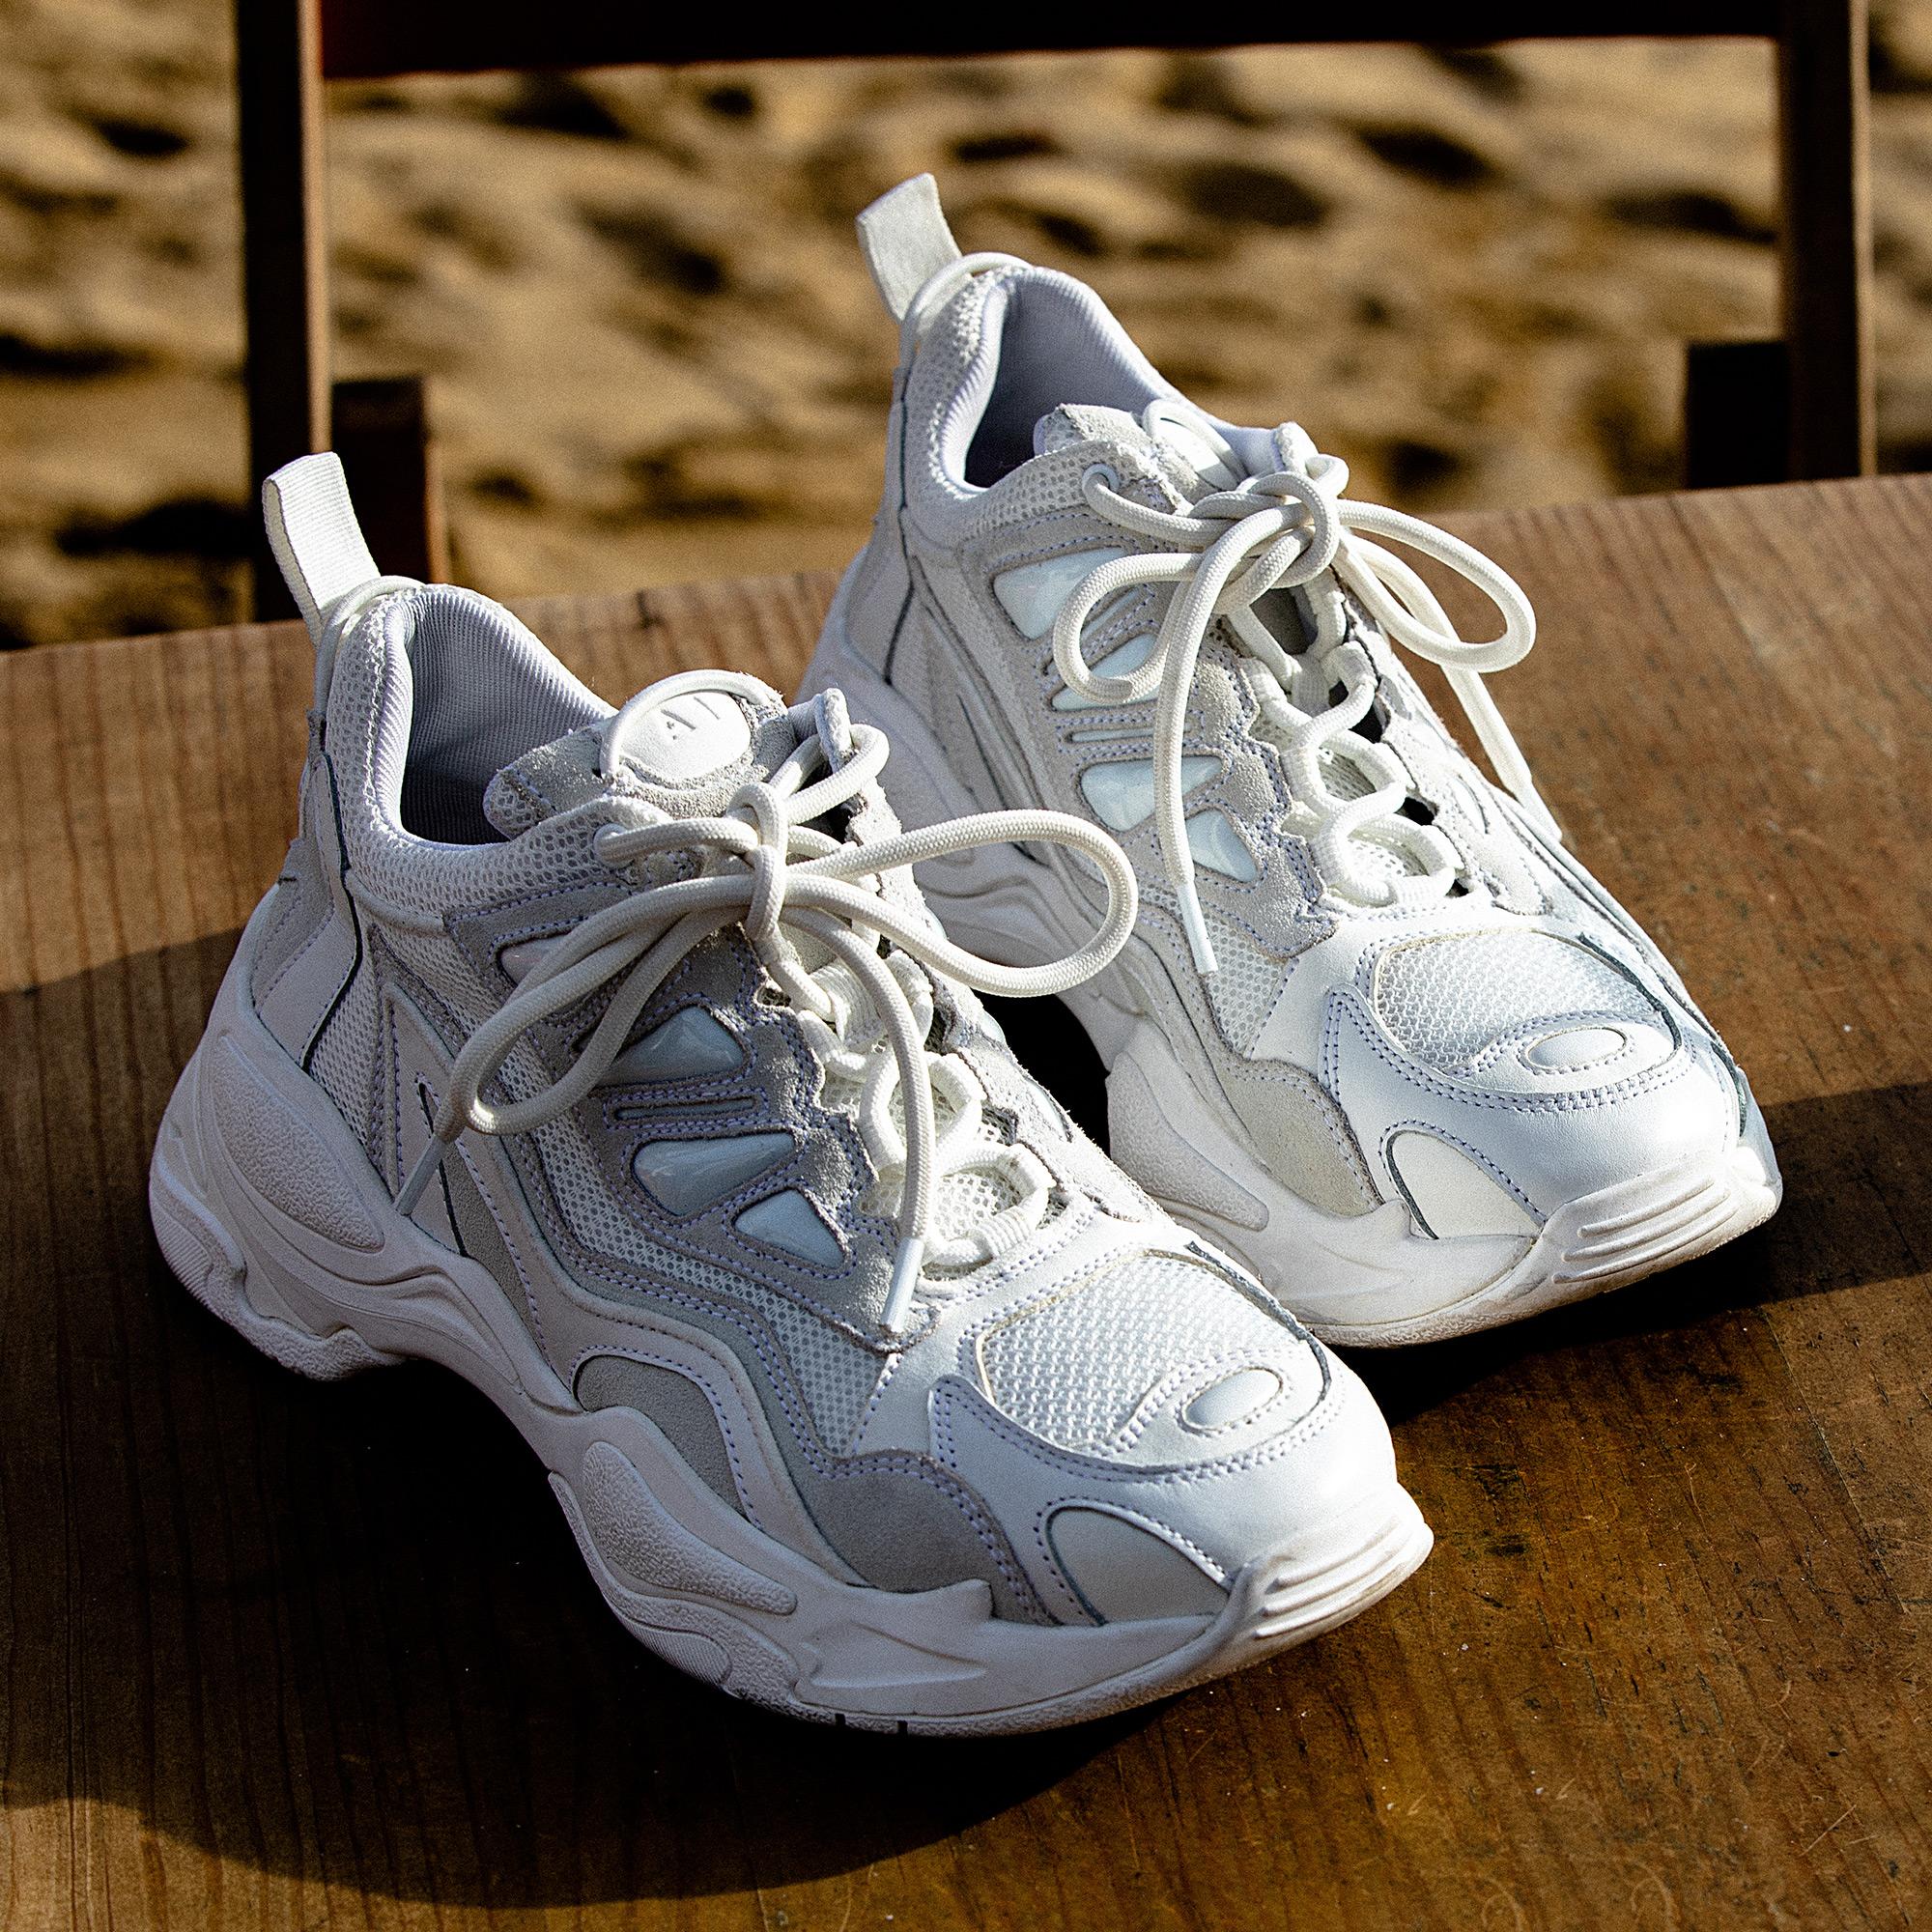 e158cb097e98 ... Astro sneakers with graphic soles   Shoes color white ...